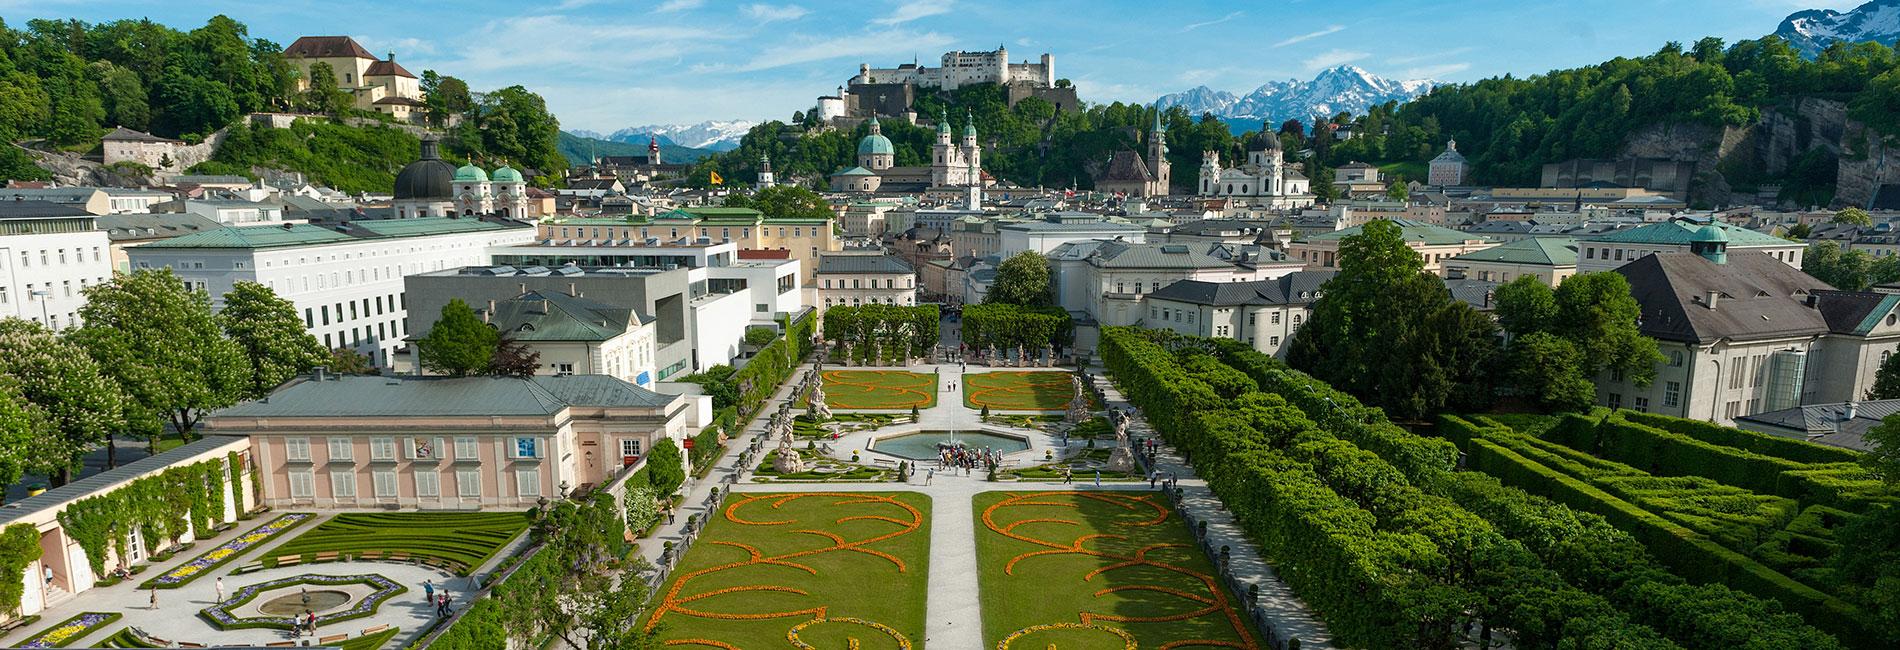 Salzburg Guide Tourismus - Mirabell